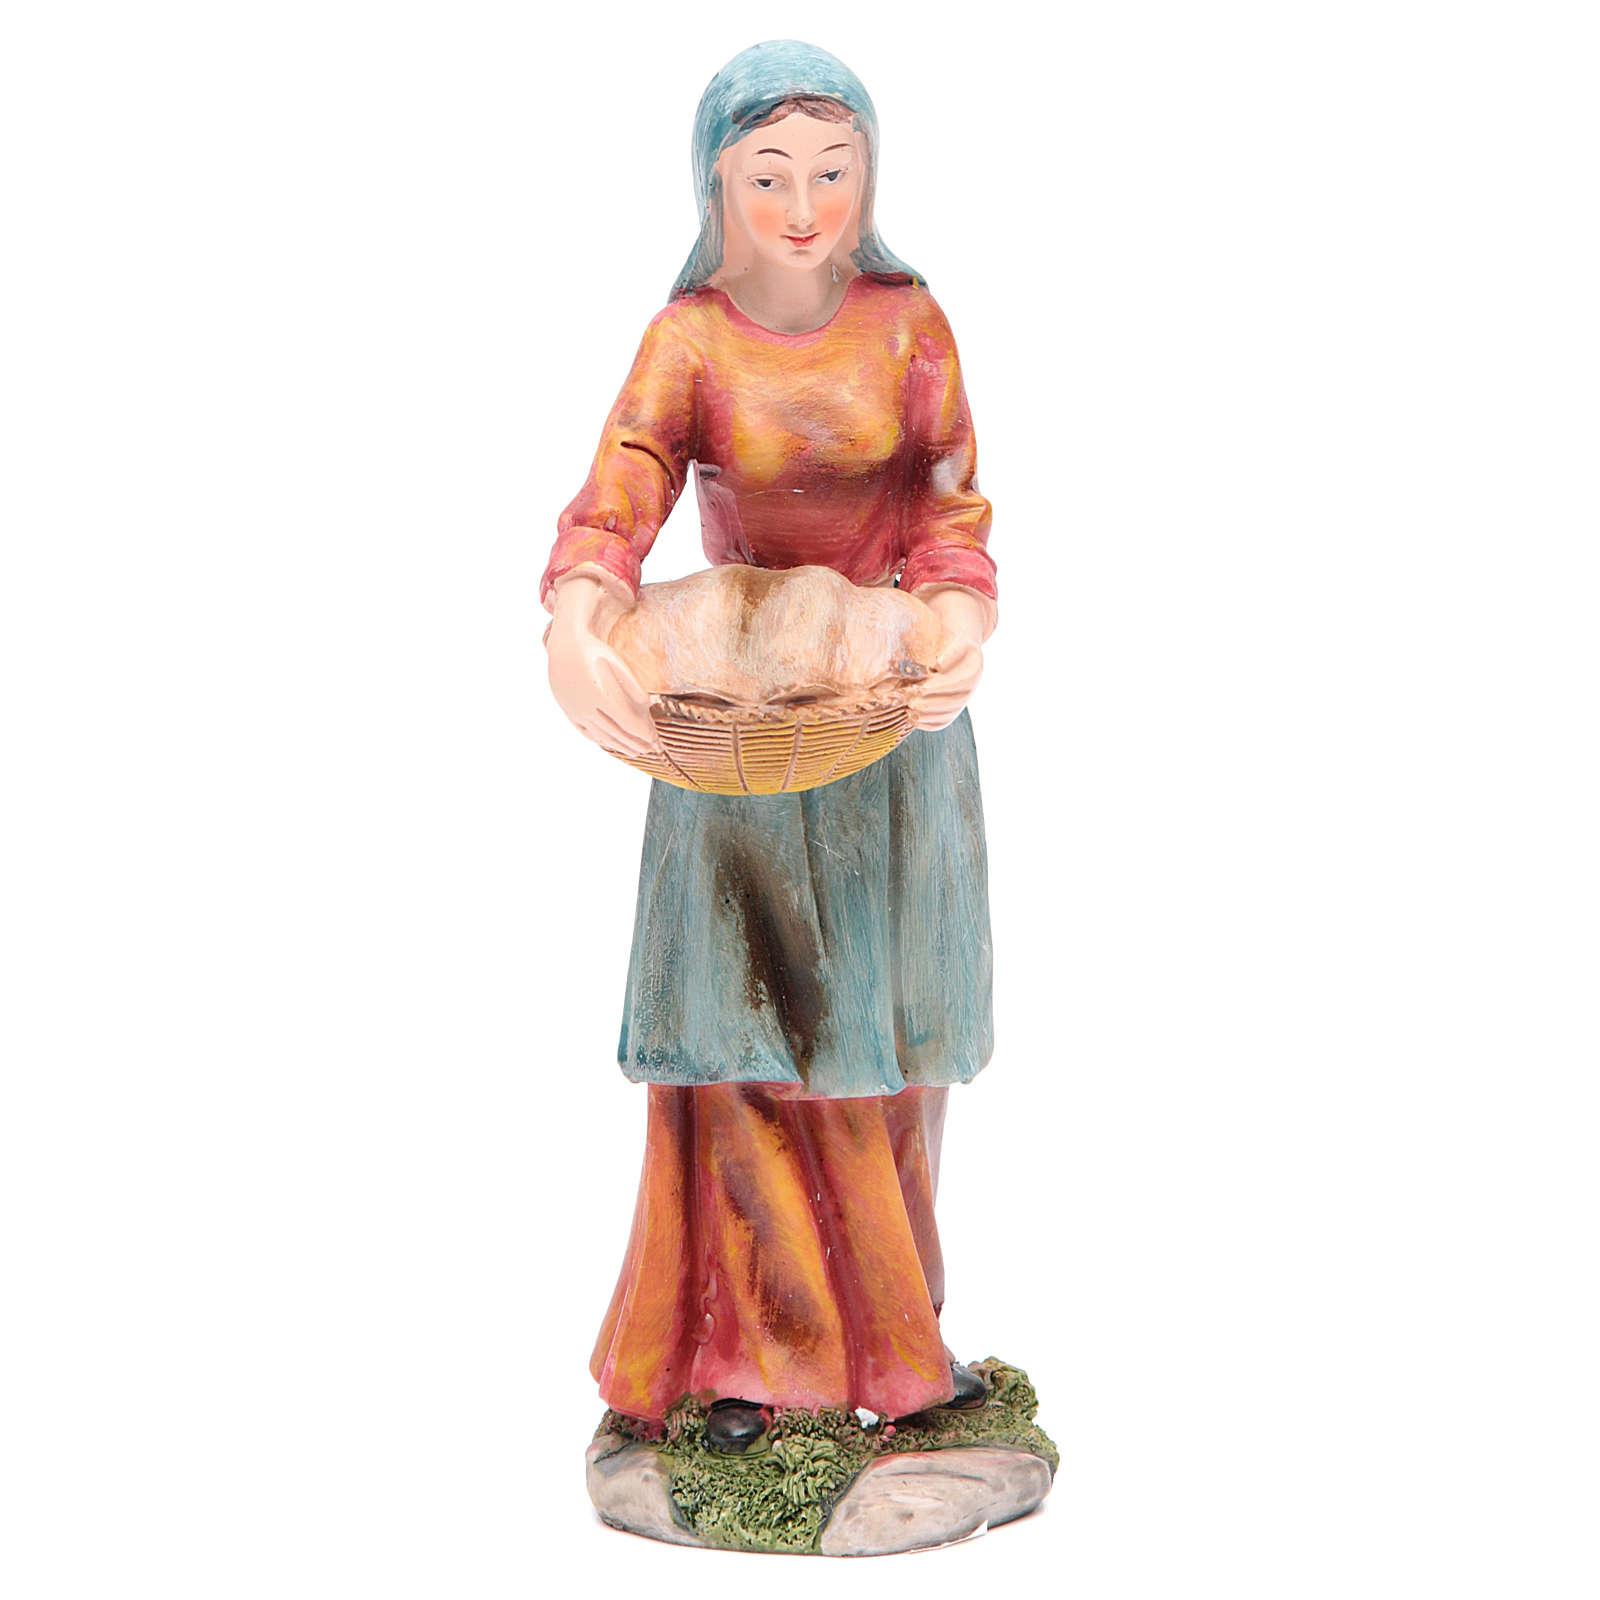 Donna con cesto 21 cm presepe resina 3